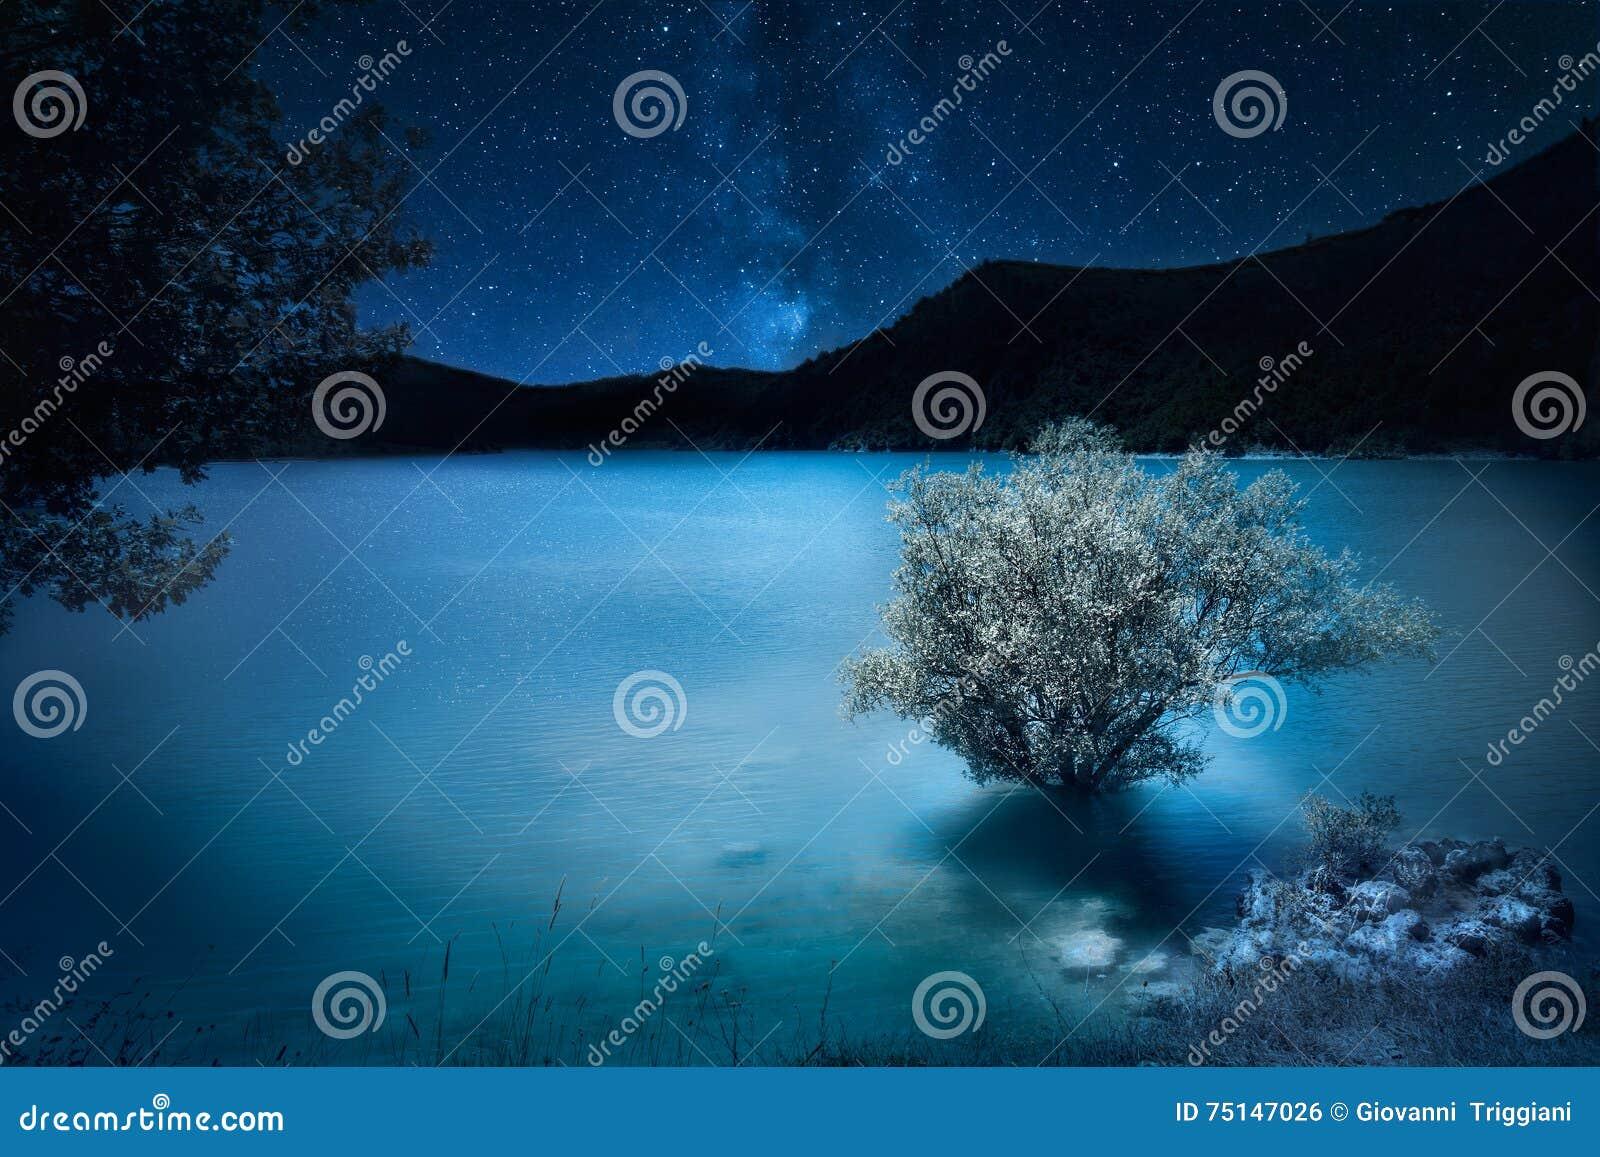 Night deep dark blue. Milky way stars over mountain lake. Magic